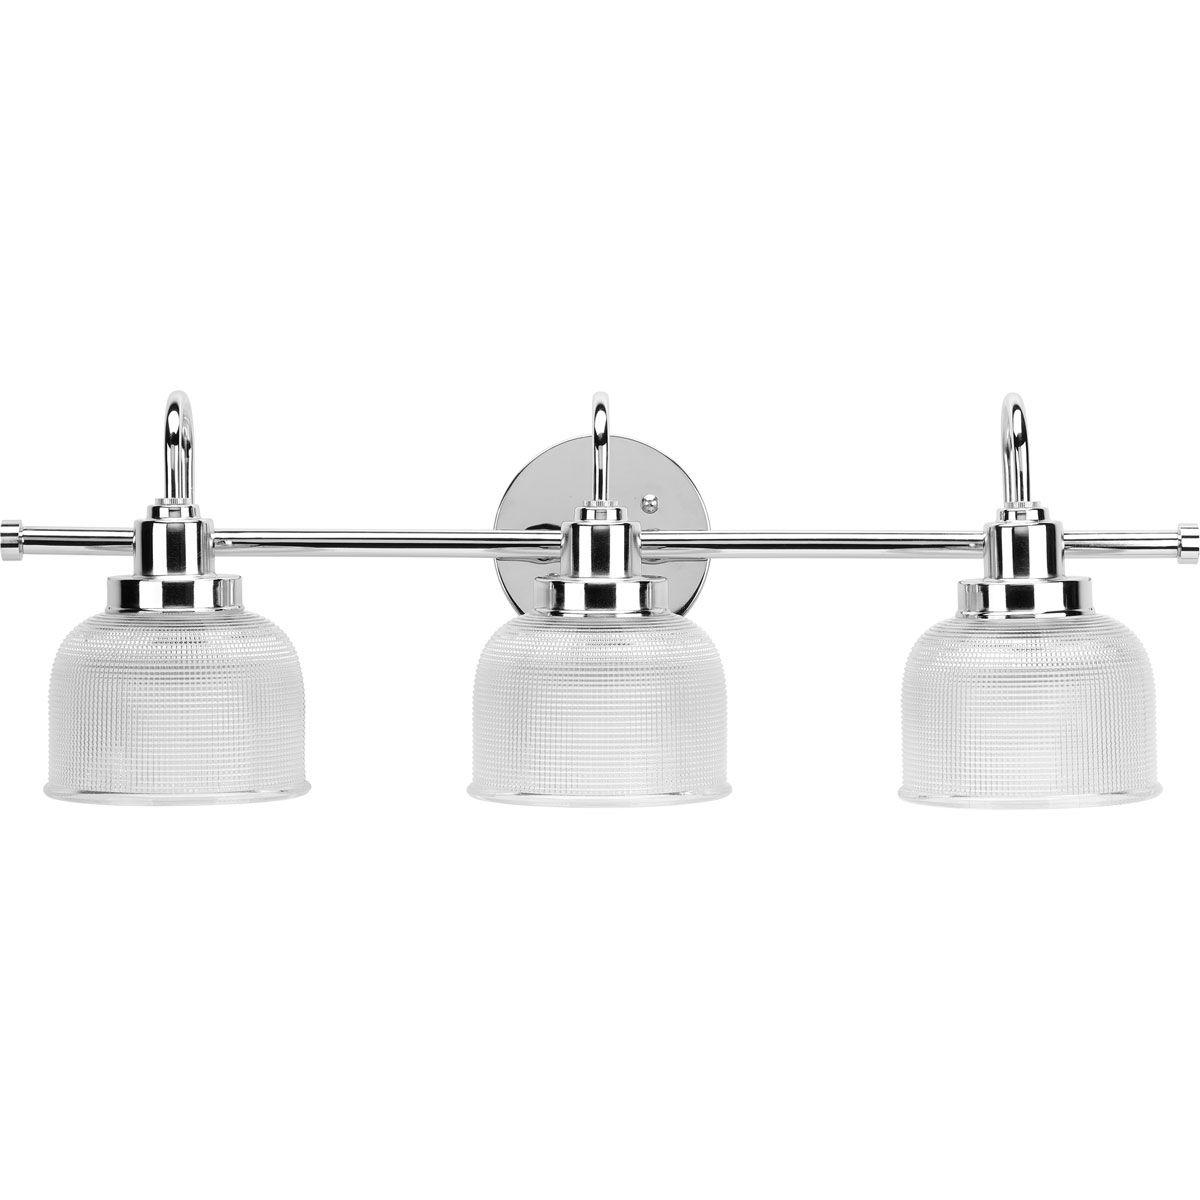 Miseno MLITBN Brushed Nickel Bella Light Bathroom Vanity - Brass bathroom vanity light fixtures